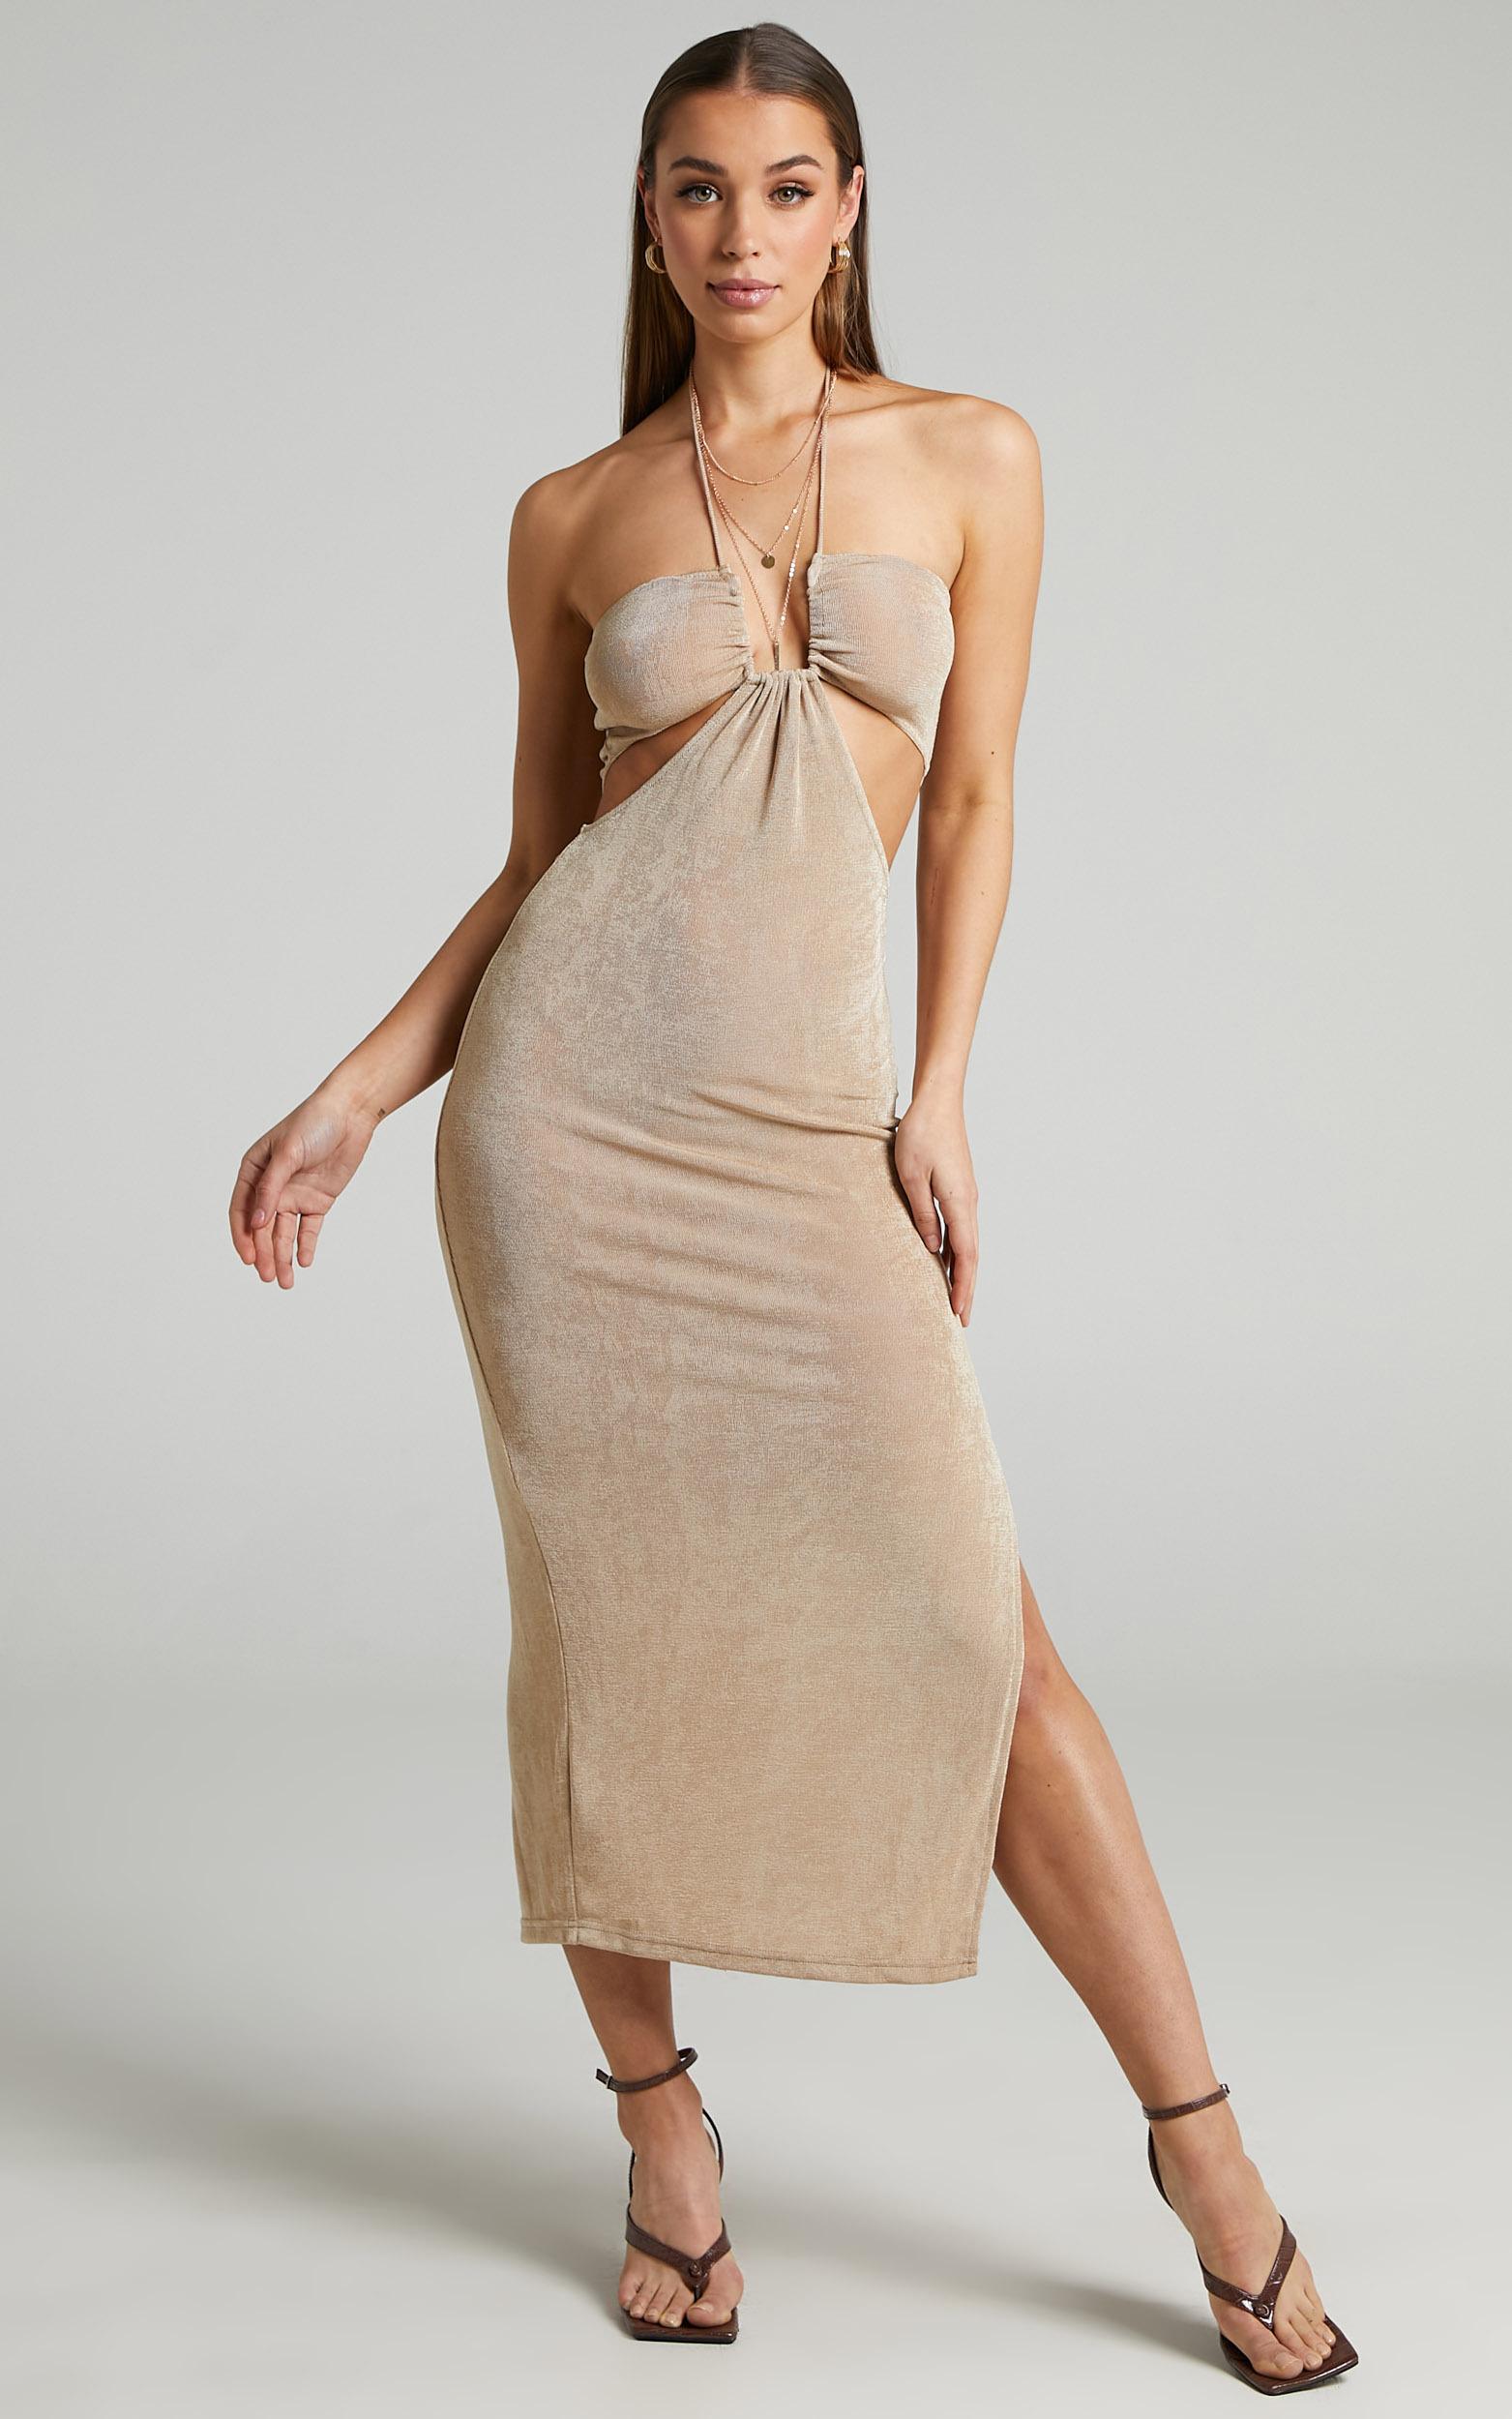 Runaway The Label - Jodi Midi Dress in Gold - L, GLD1, hi-res image number null